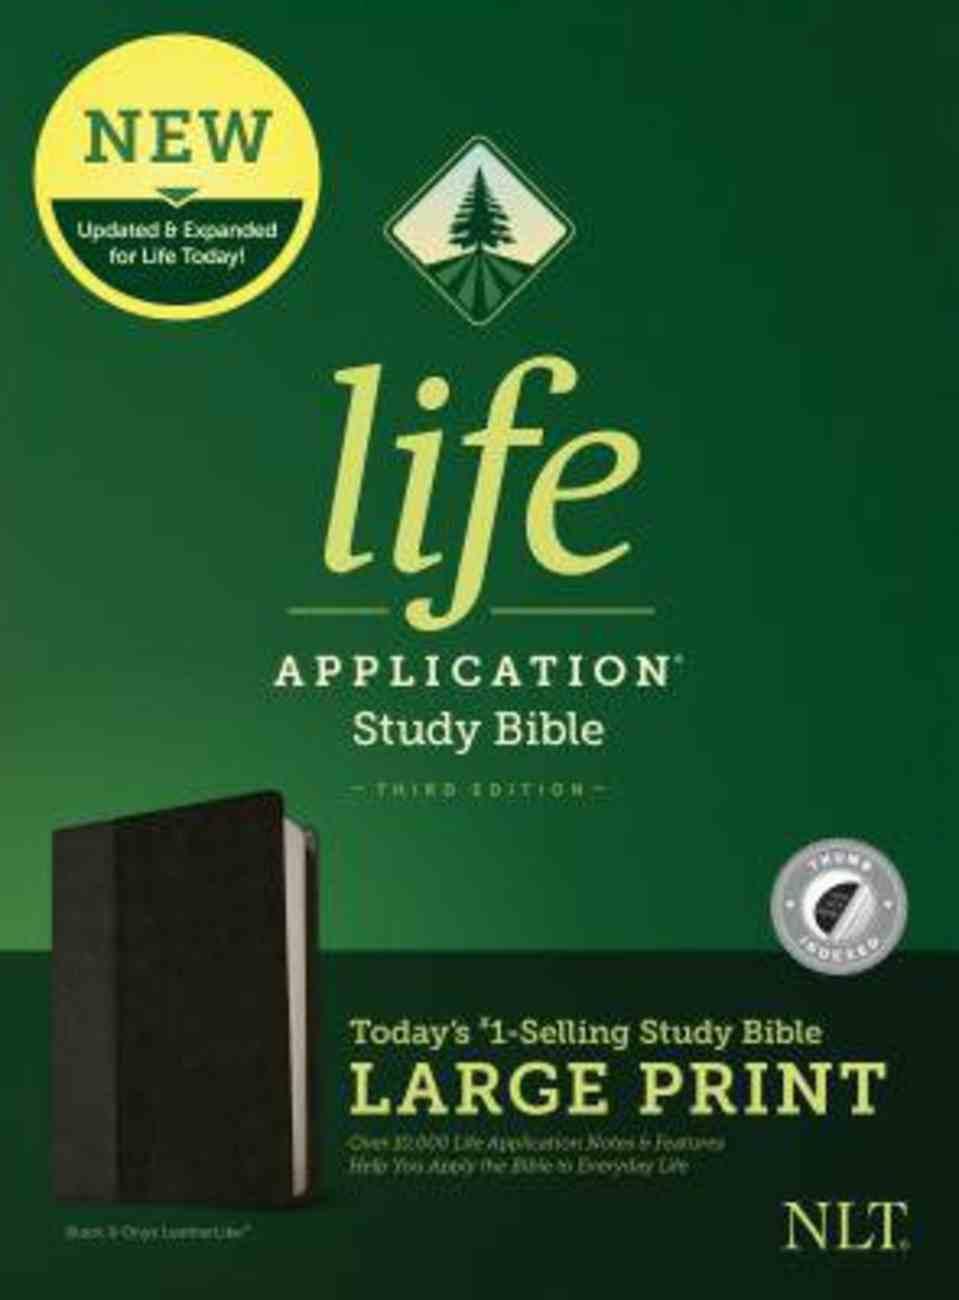 NLT Life Application Study Bible Third Edition Large Print Black/Onyx Indexed (Black Letter Edition) Imitation Leather